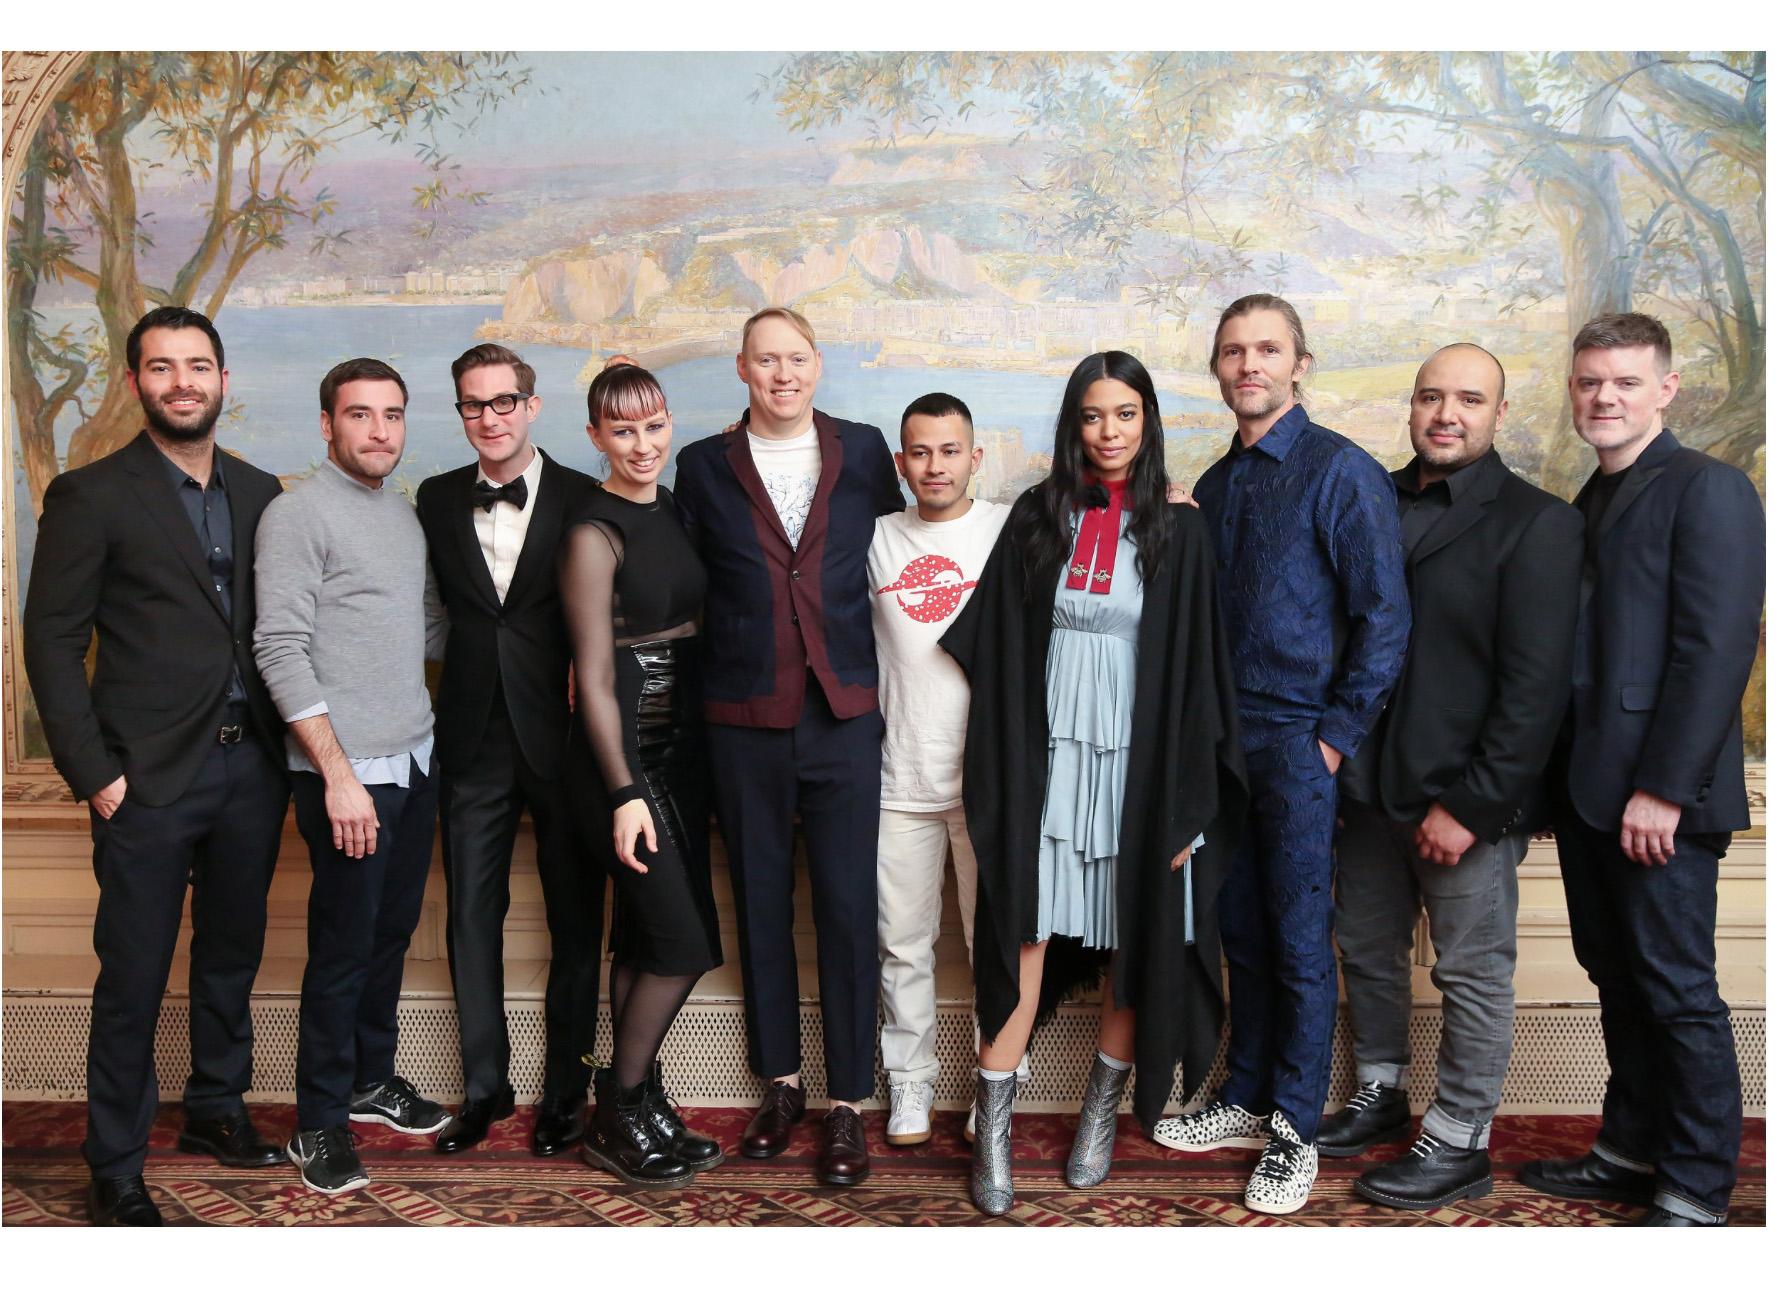 KellyTaub_Vogue_10.jpg